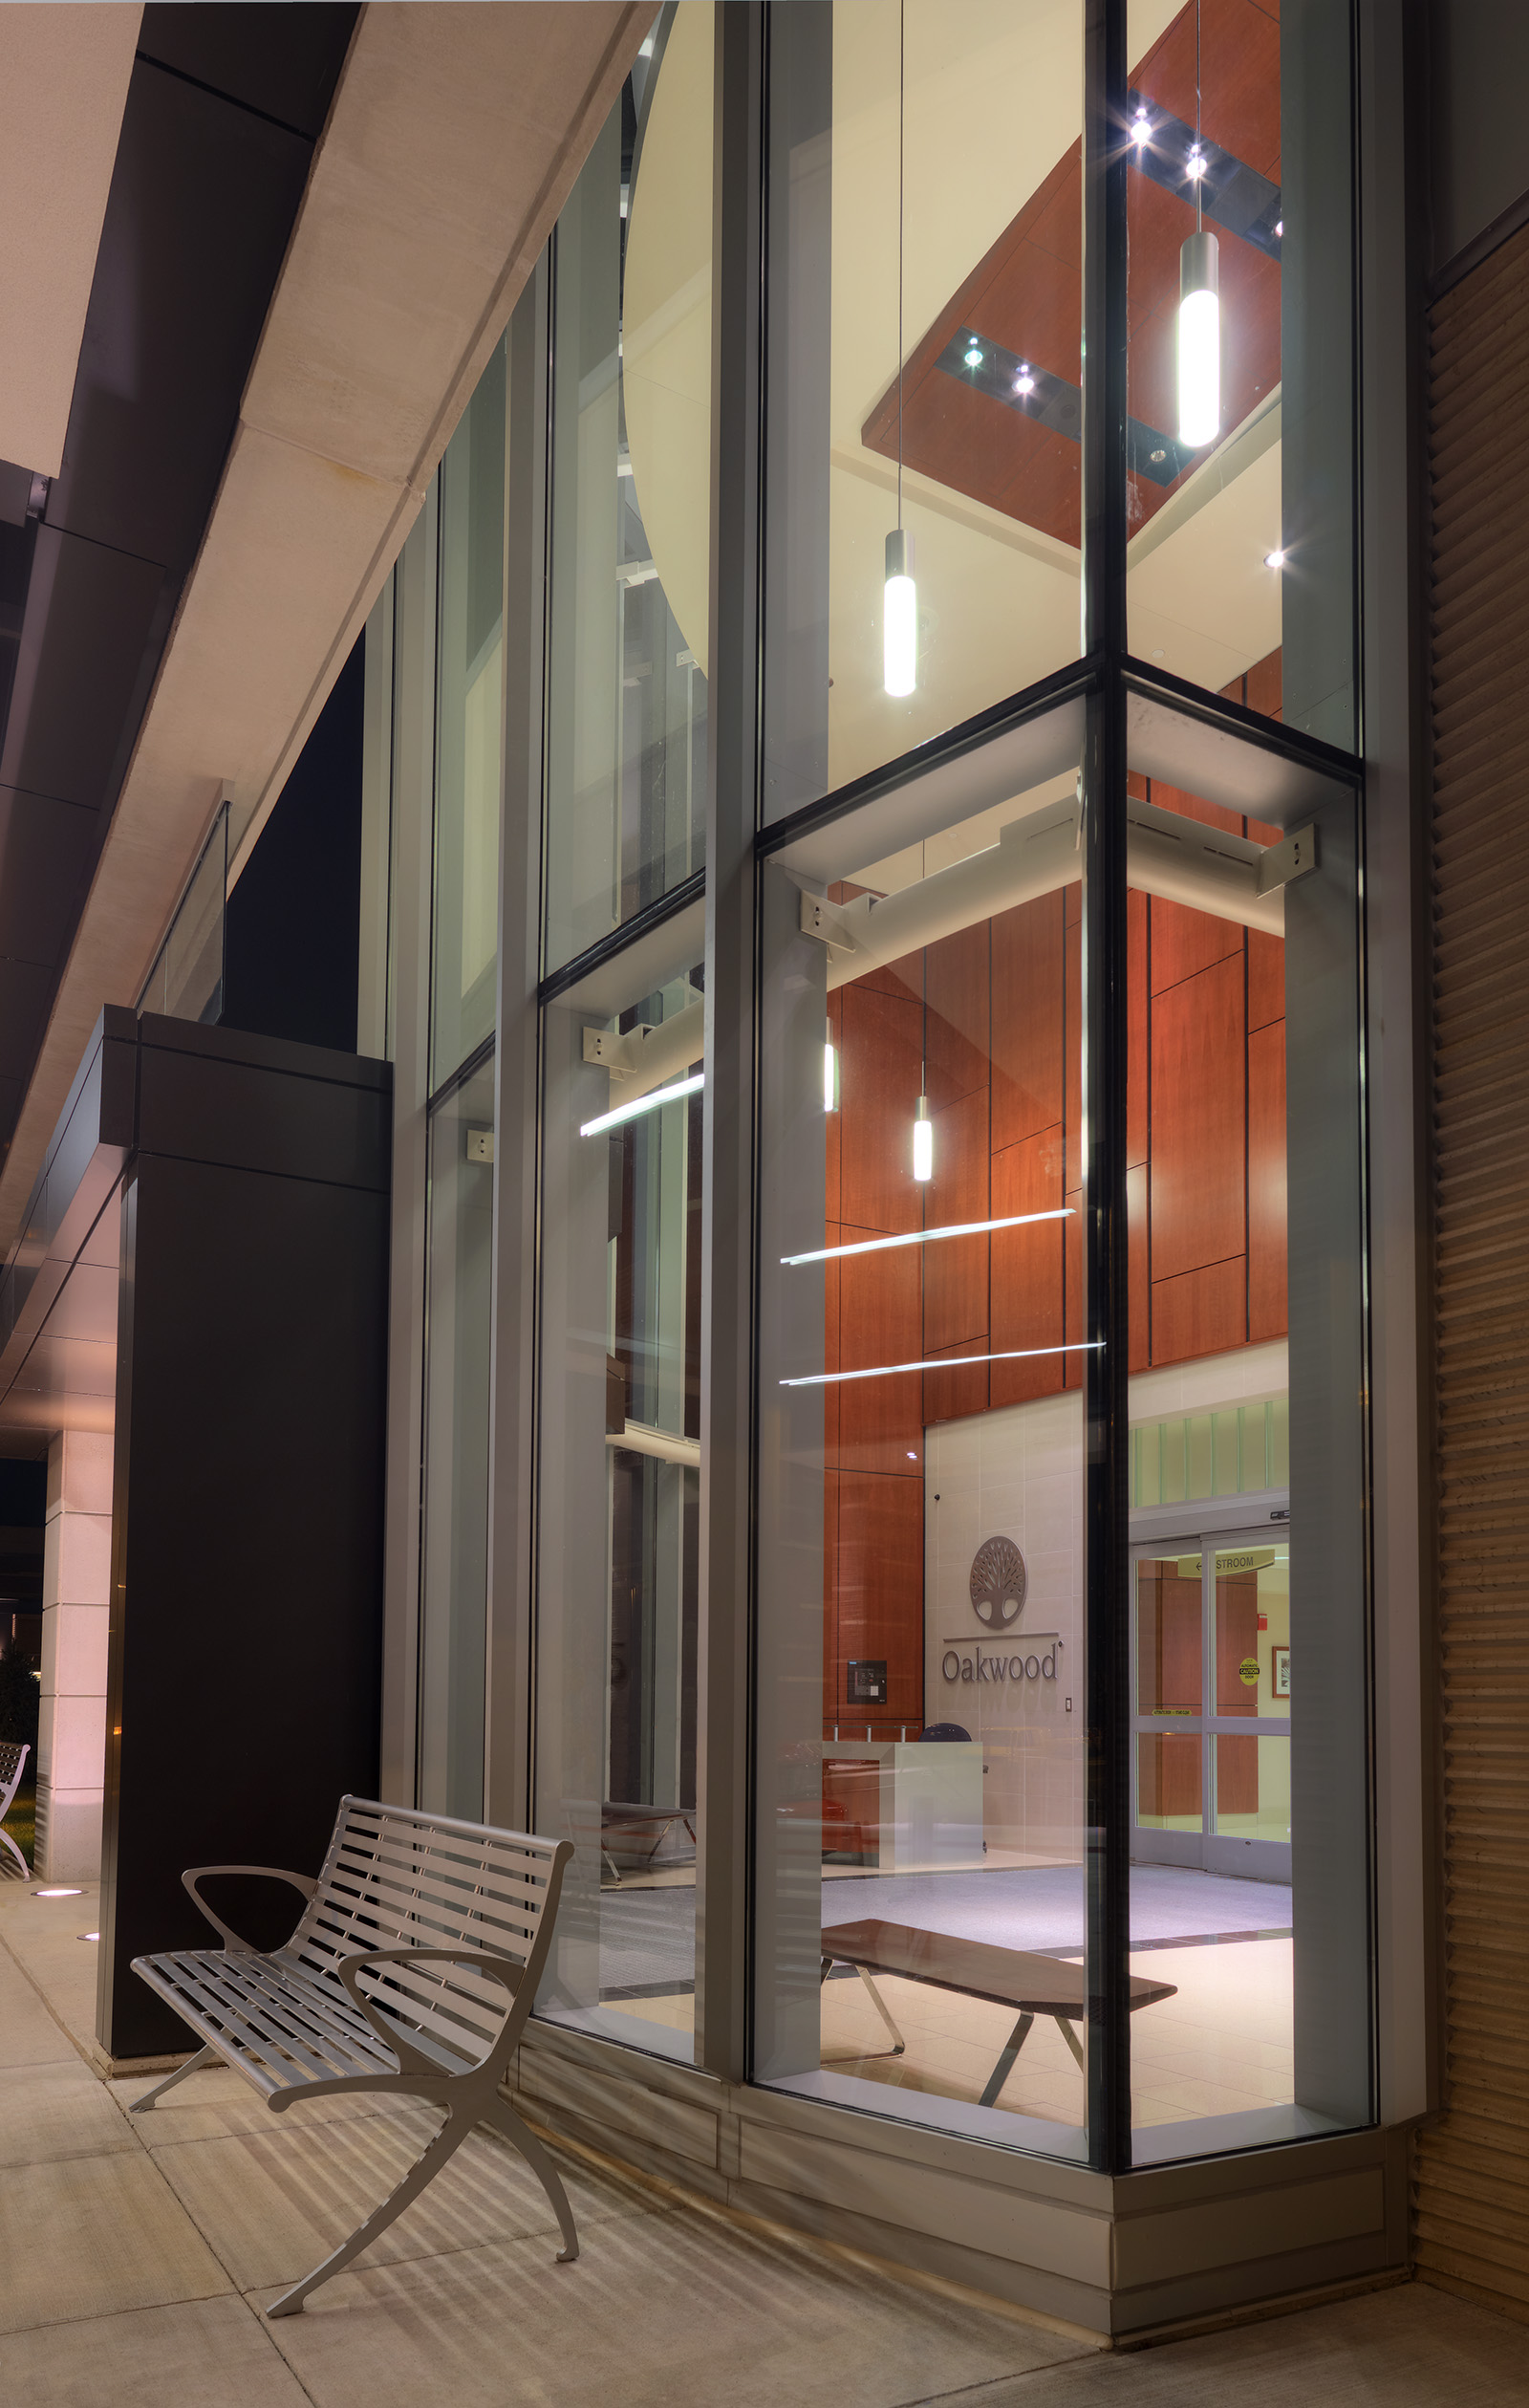 oakwood-heritage-hospital-entrance